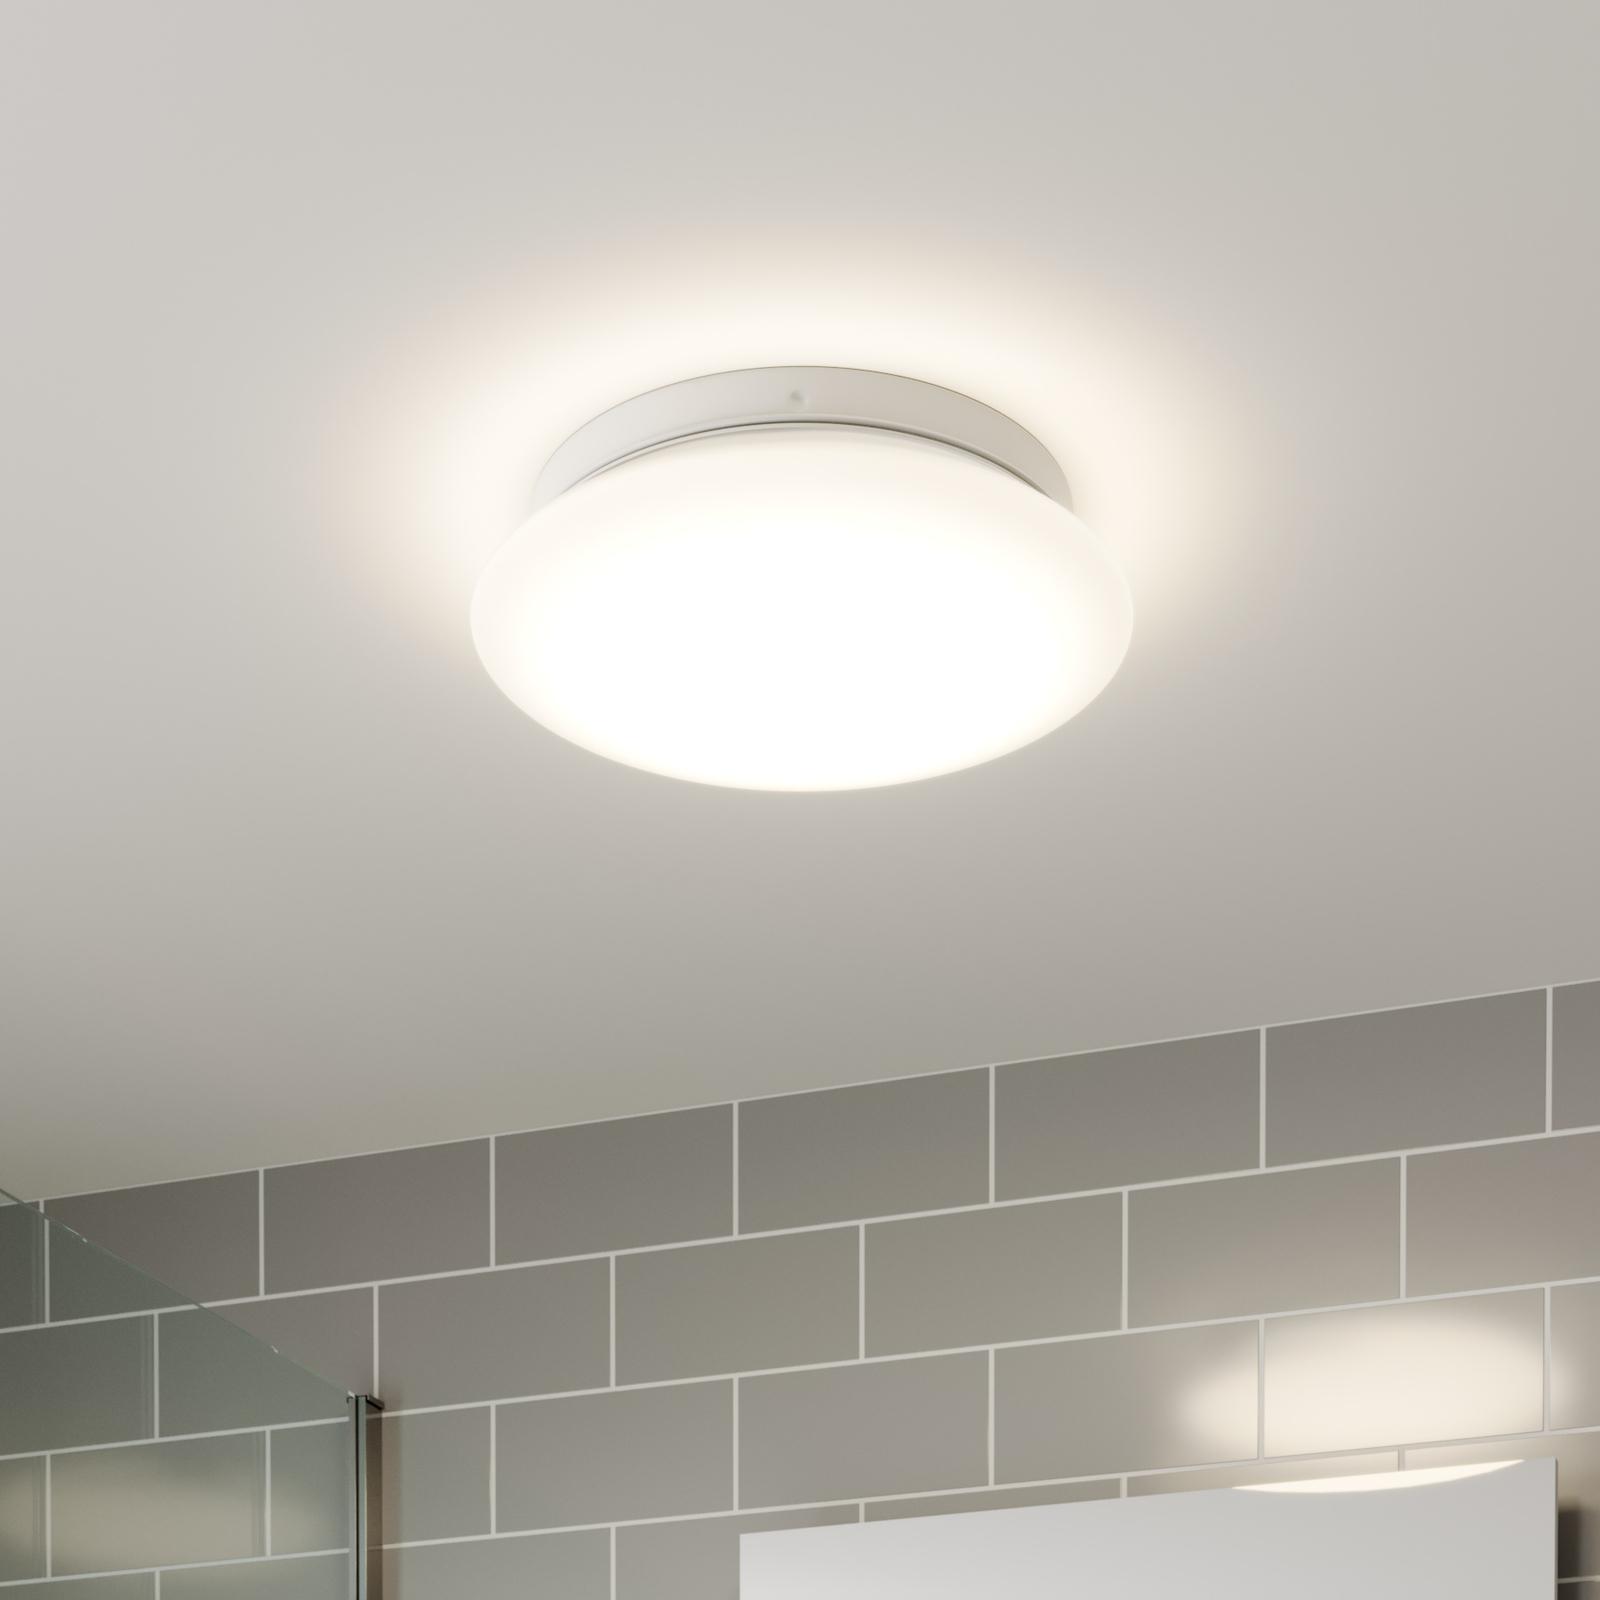 Arcchio Solomia LED-taklampa, sensor, 4000K